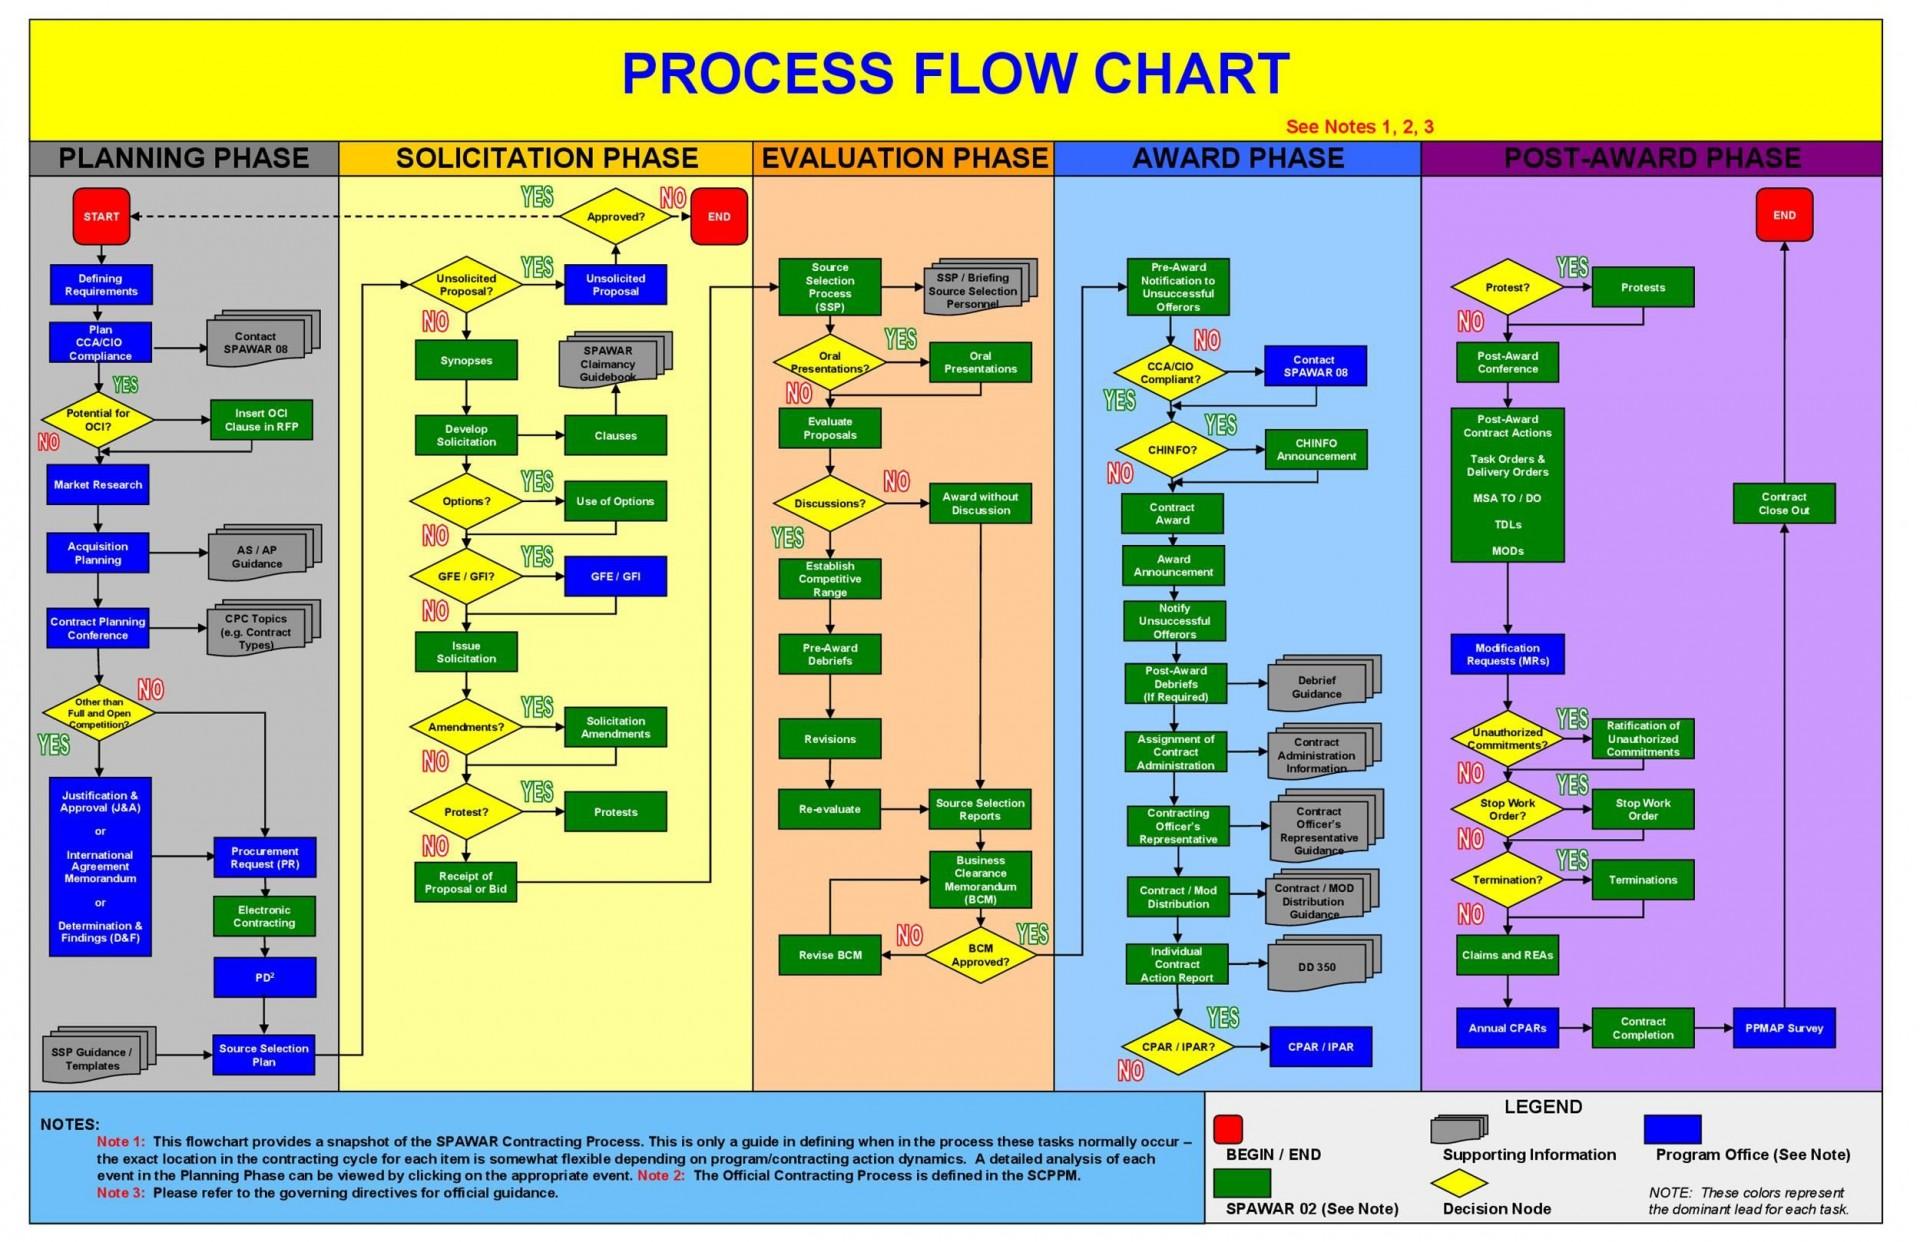 005 Fascinating Free Flowchart Template Excel 2010 Design 1920